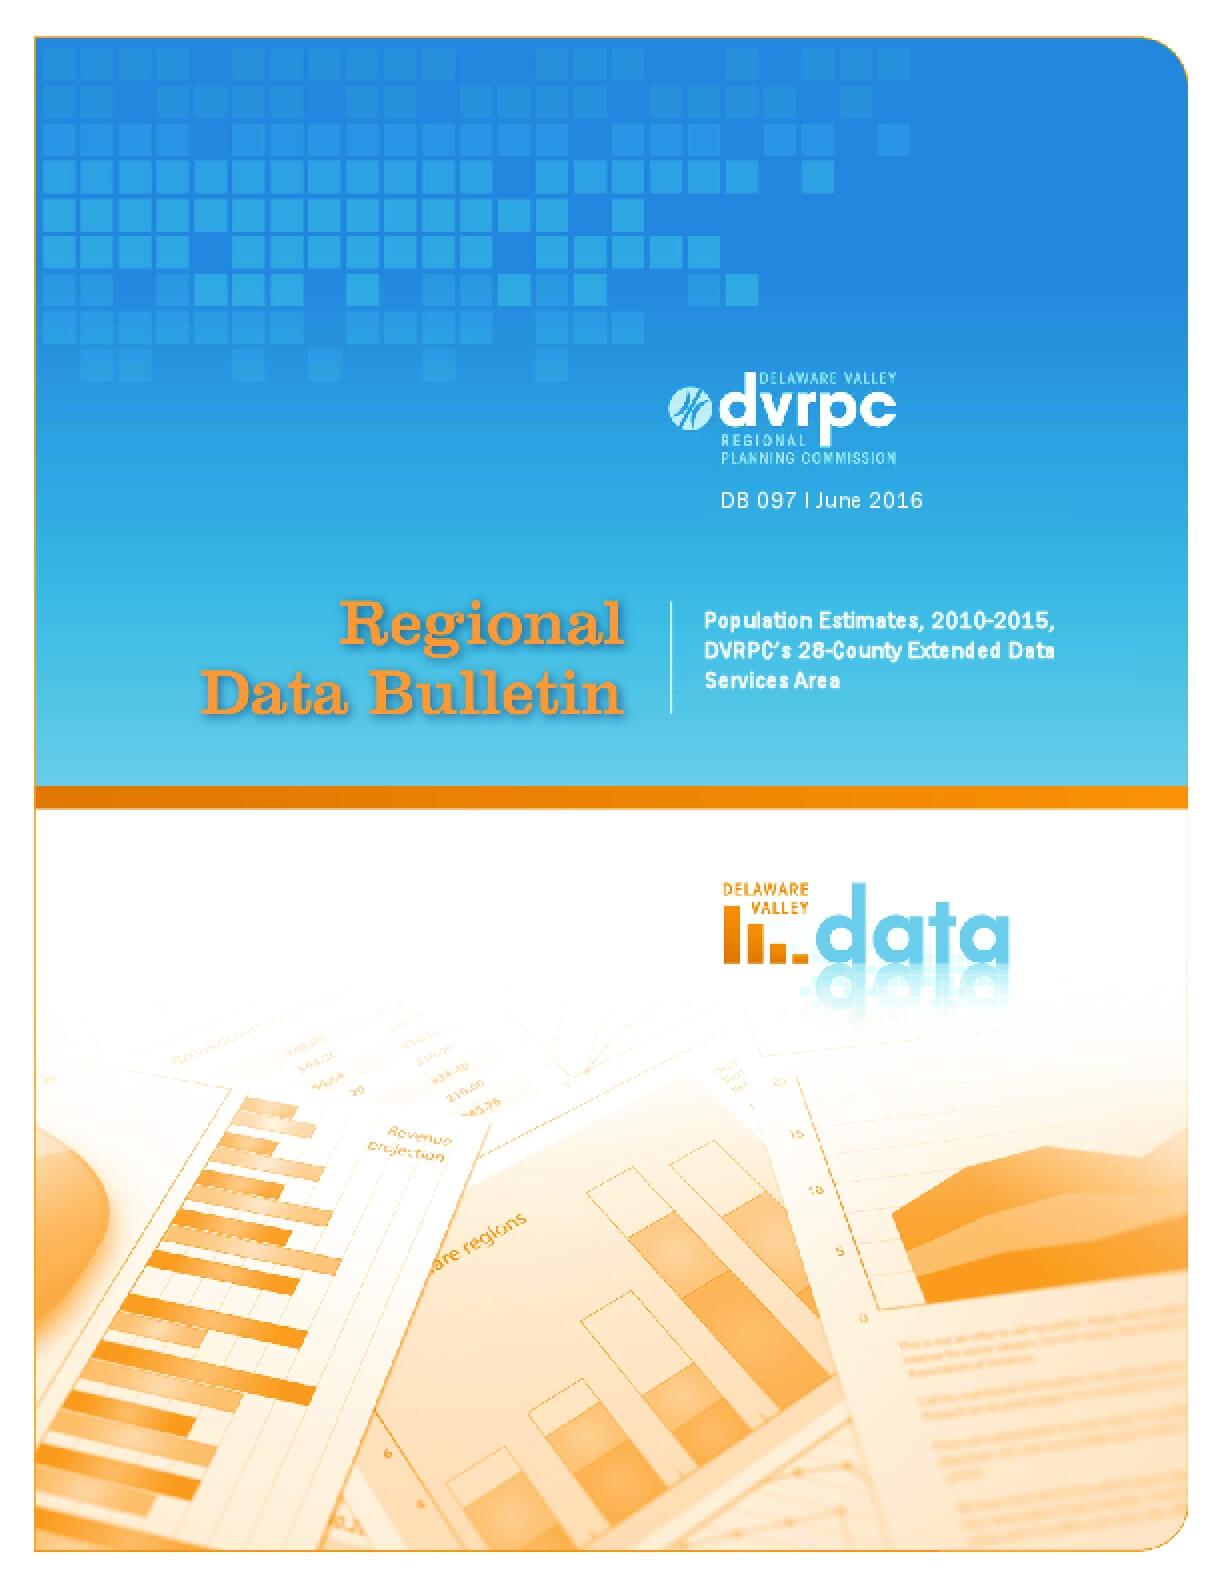 Population Estimates, 2010-2015, DVRPC's 28-County Extended Data Services Area